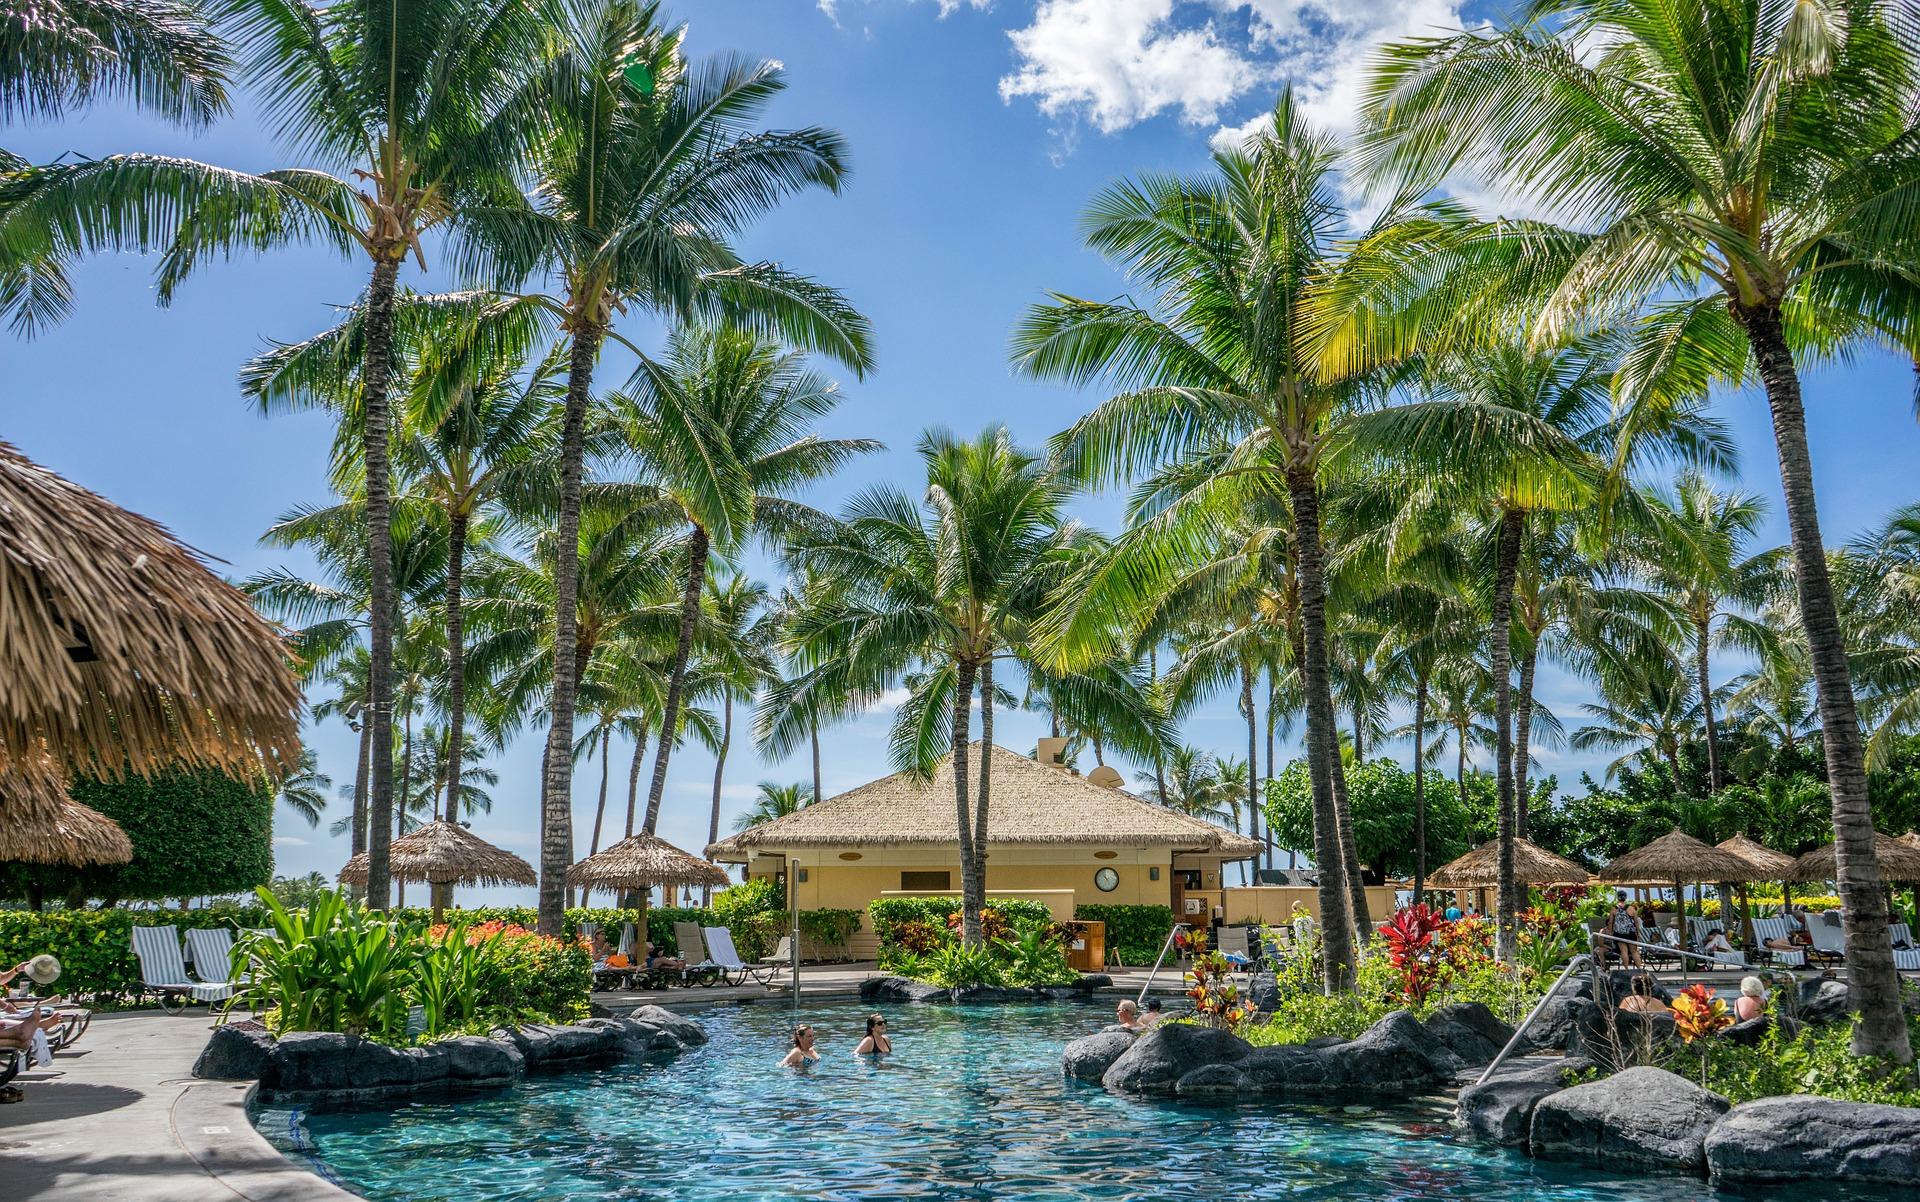 Marriott's Ko'Olina Hotel on Oahu, Hawaii